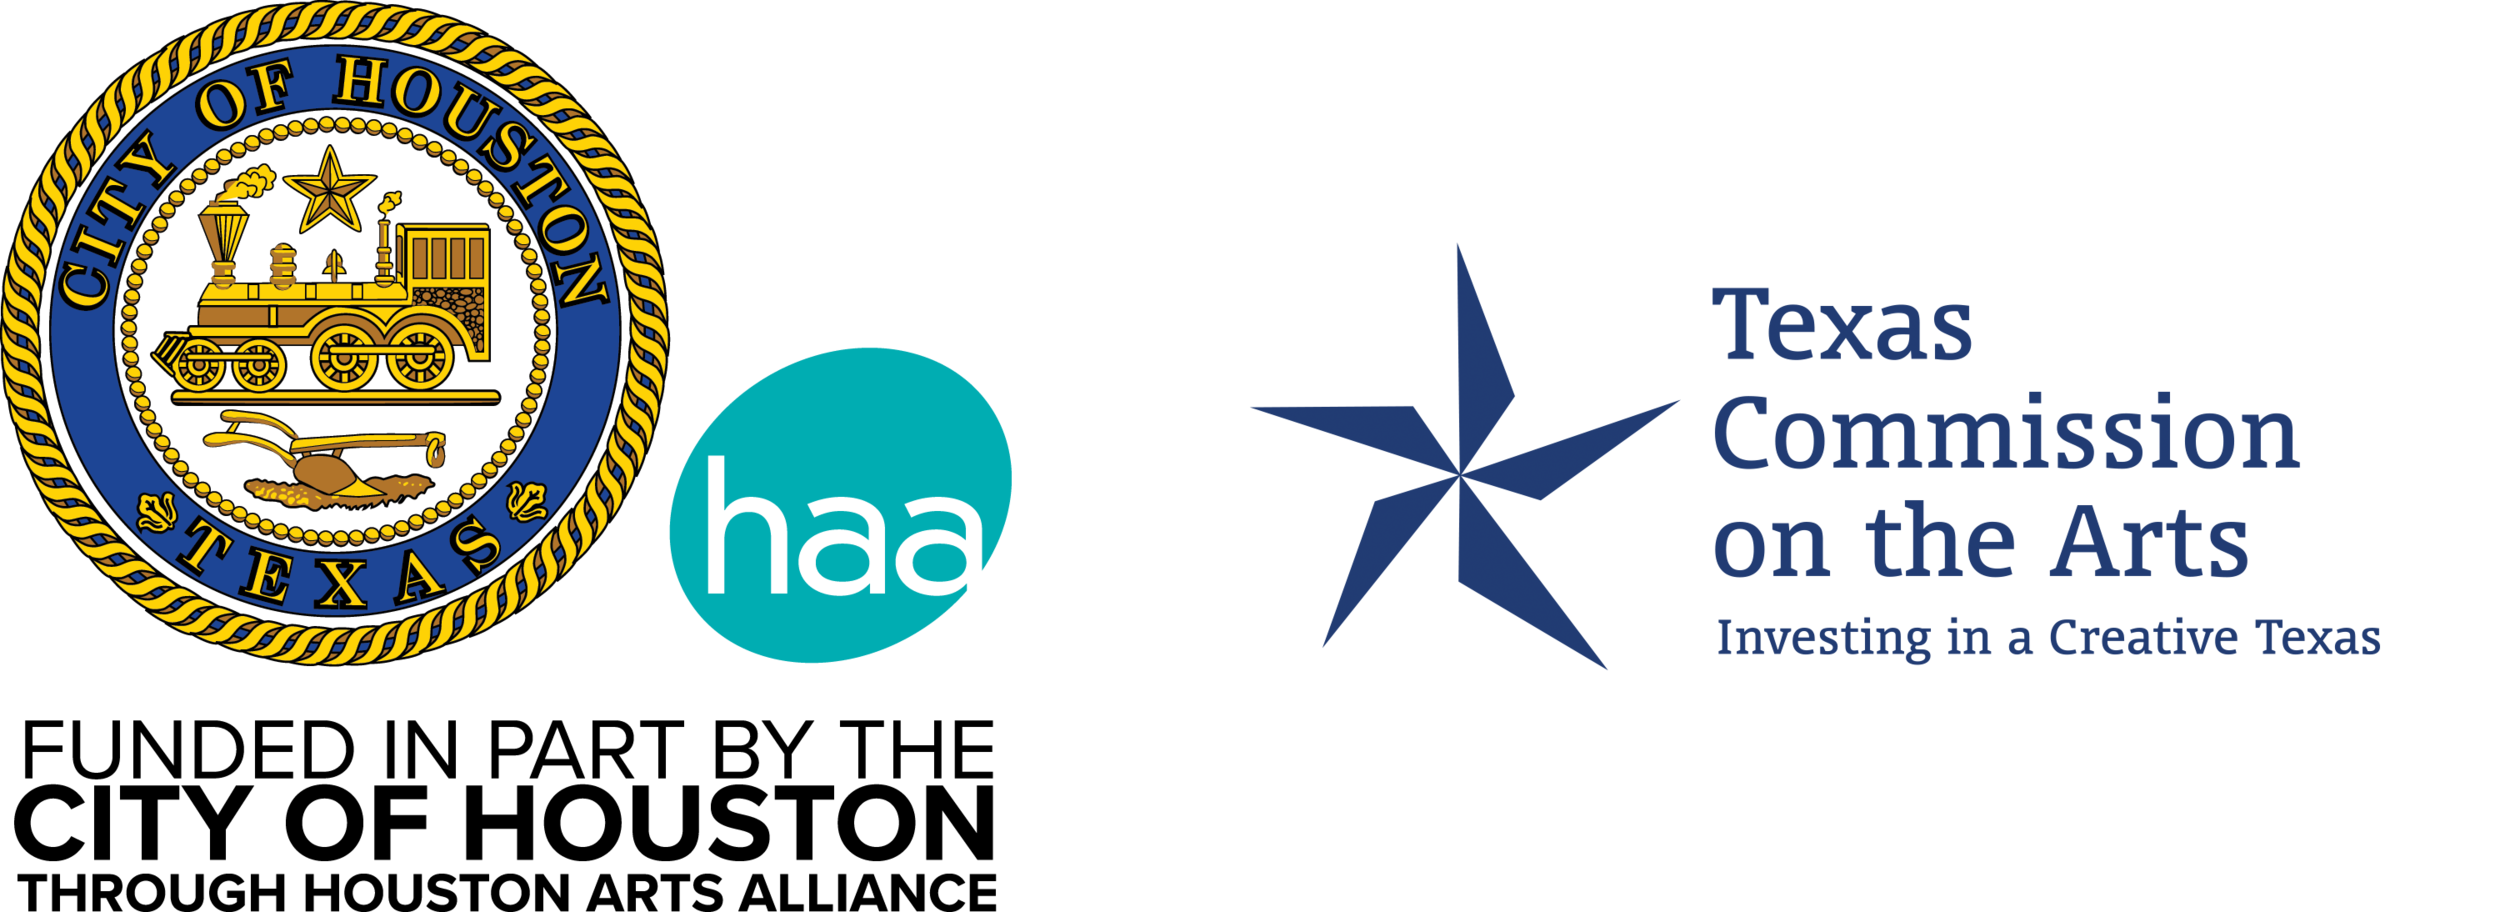 Grant organization logos.png